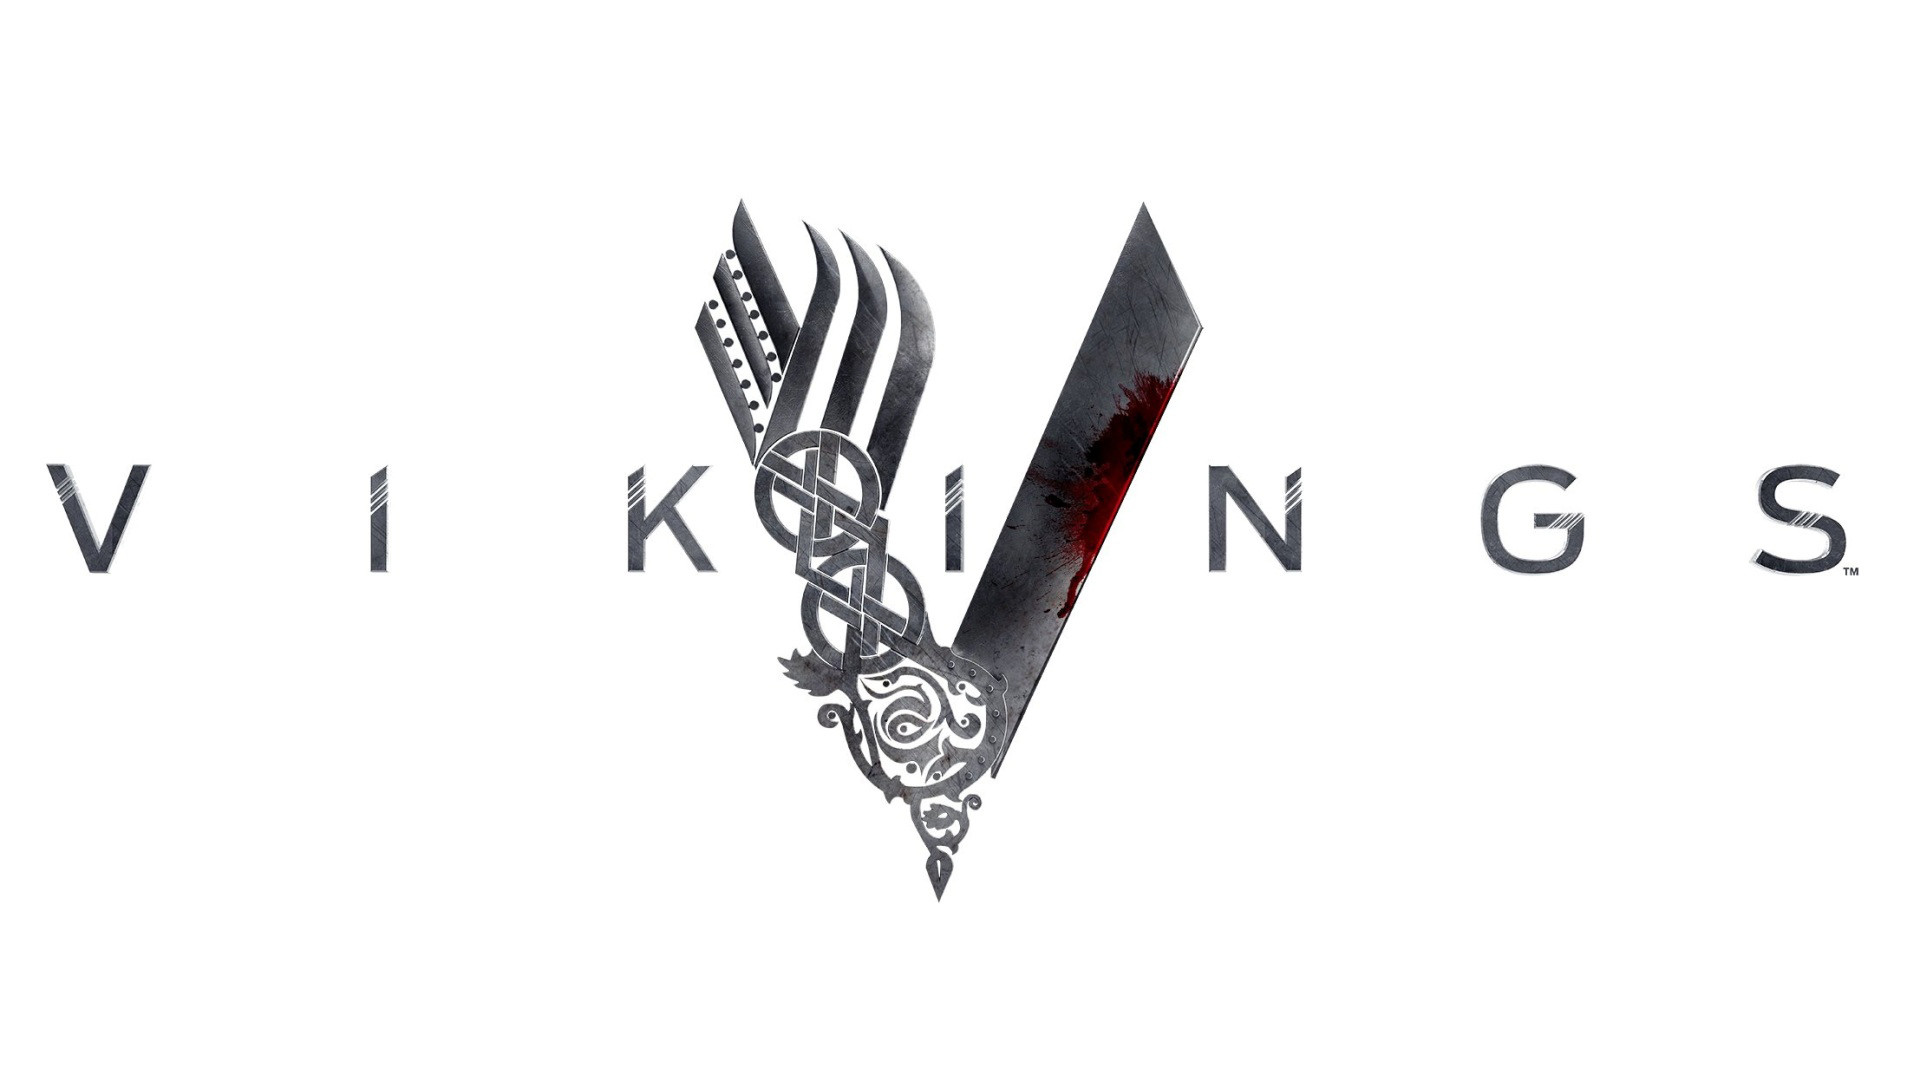 vikings tv show women   Vikings TV Series Logo Wallpaper Wide or HD   TV  Series